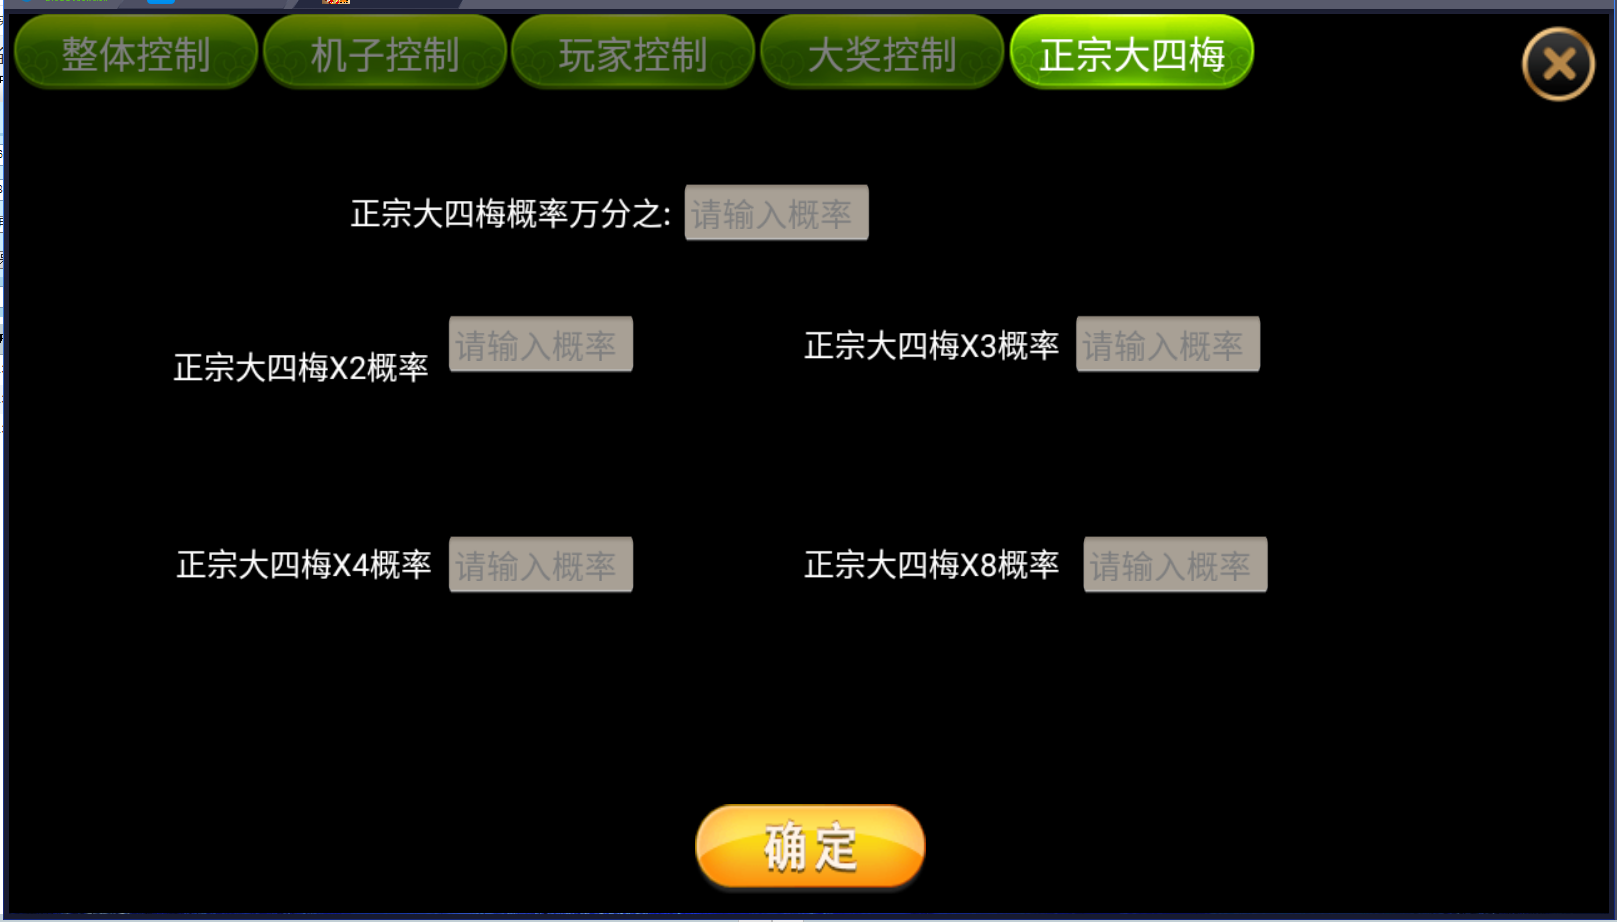 ATT翻牌鸡-运营级插图(9)